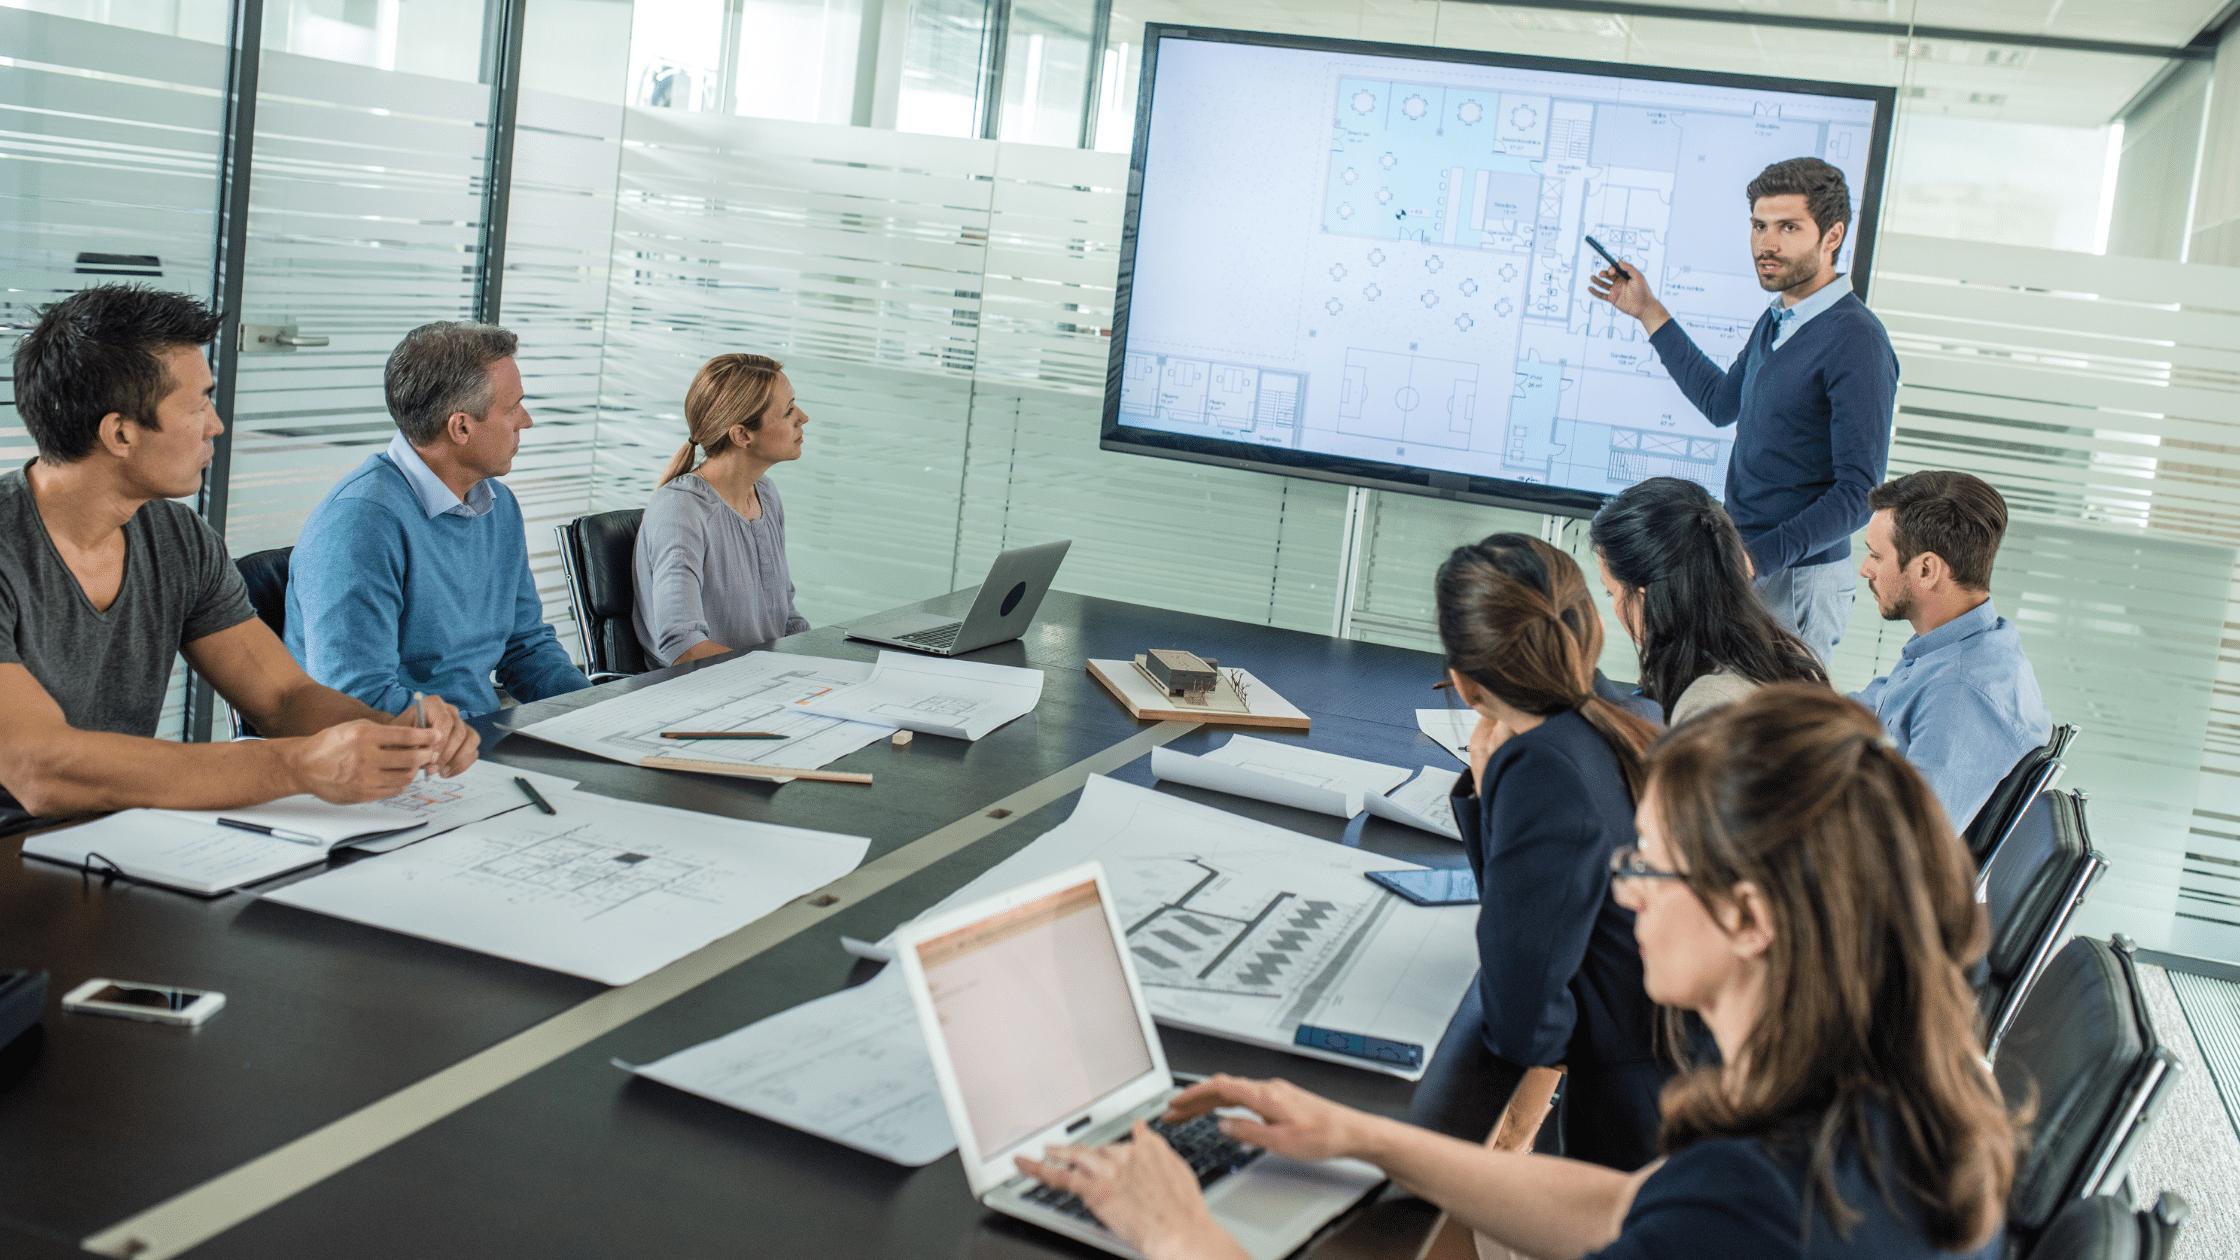 photo of a team meeting using equipment installed through an av system design